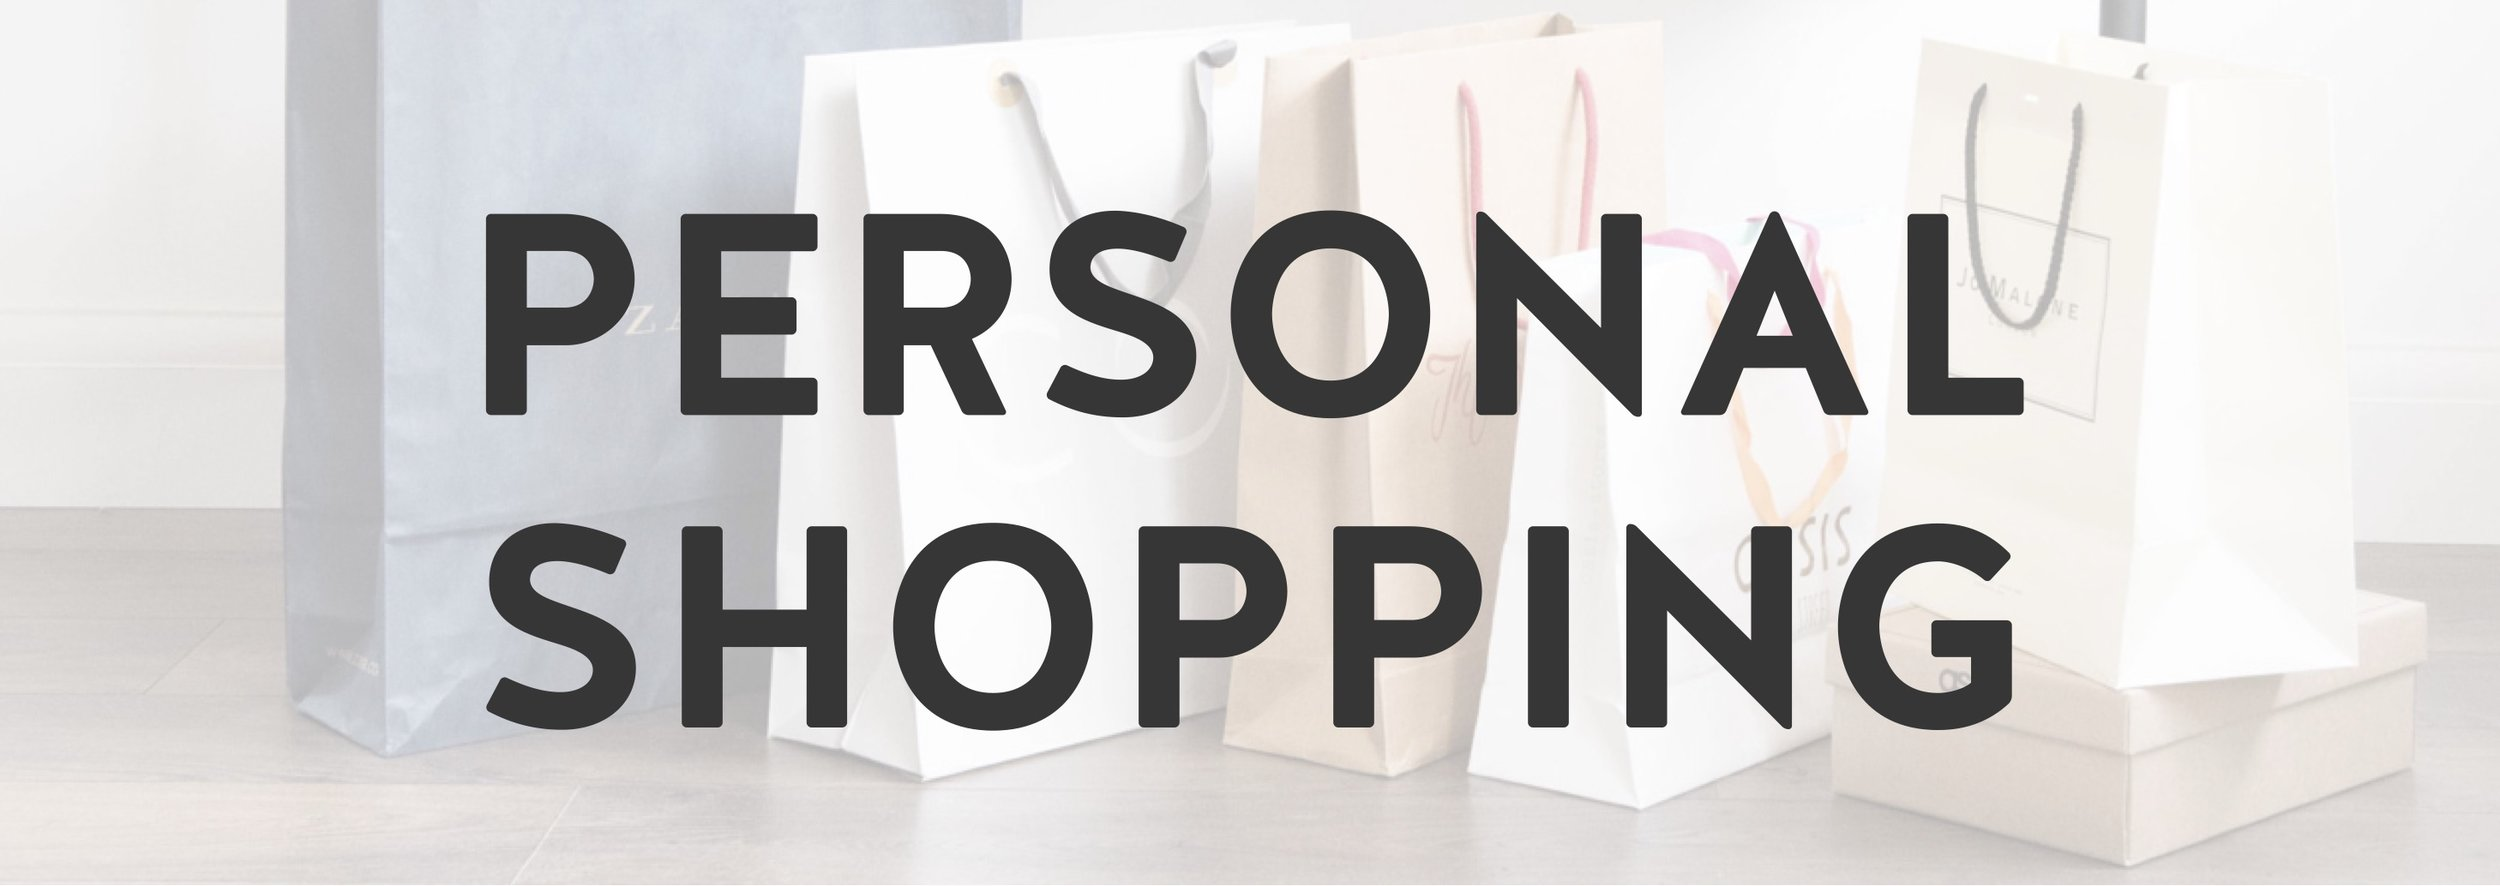 Personal Shopper Hertfordshire St Albans Cambridge Hitchin Harpenden